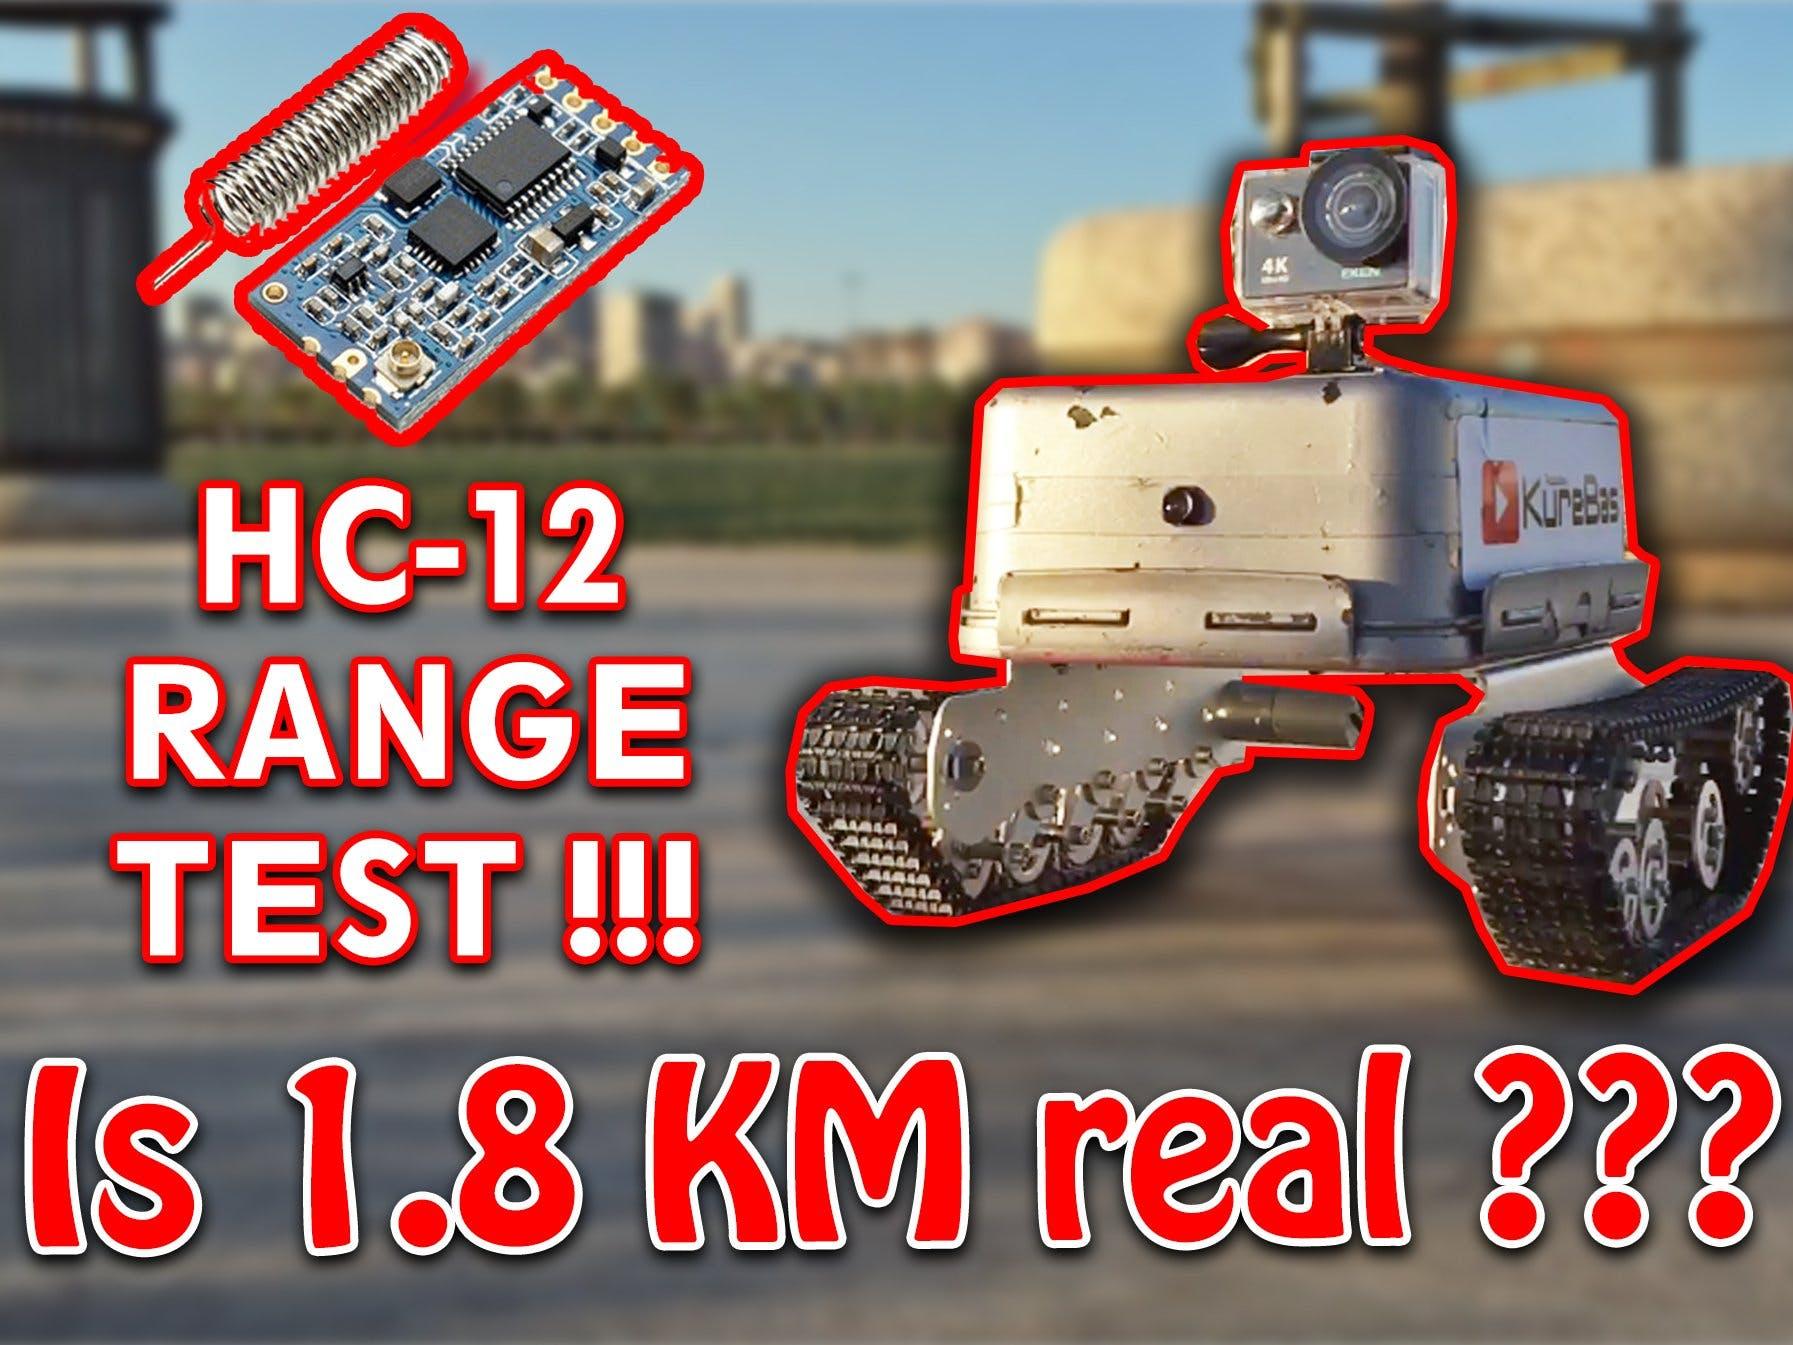 Arduino Long Range Explorer Tank KureBas V3.0 (HC-12 1.8 KM)